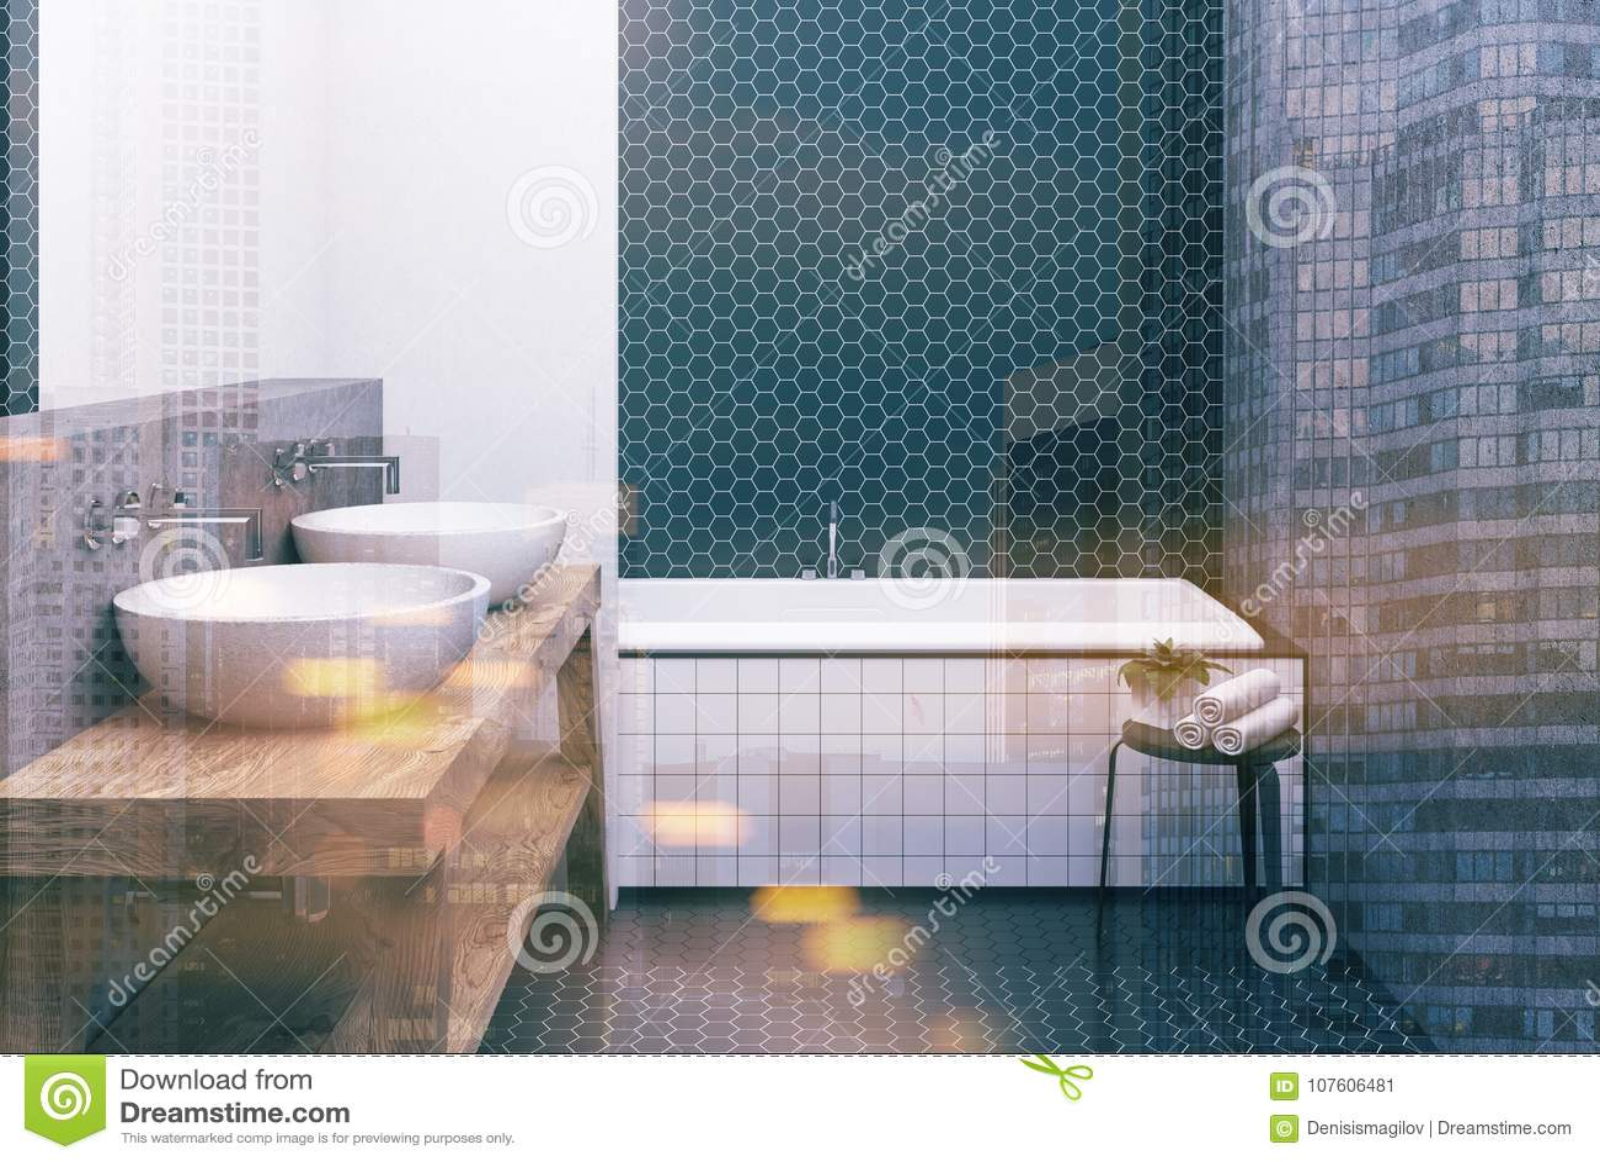 https www dreamstime com hexagon tile white black bathroom tub toned bathroom interior black hexagon tile concrete walls large angular tub image107606481